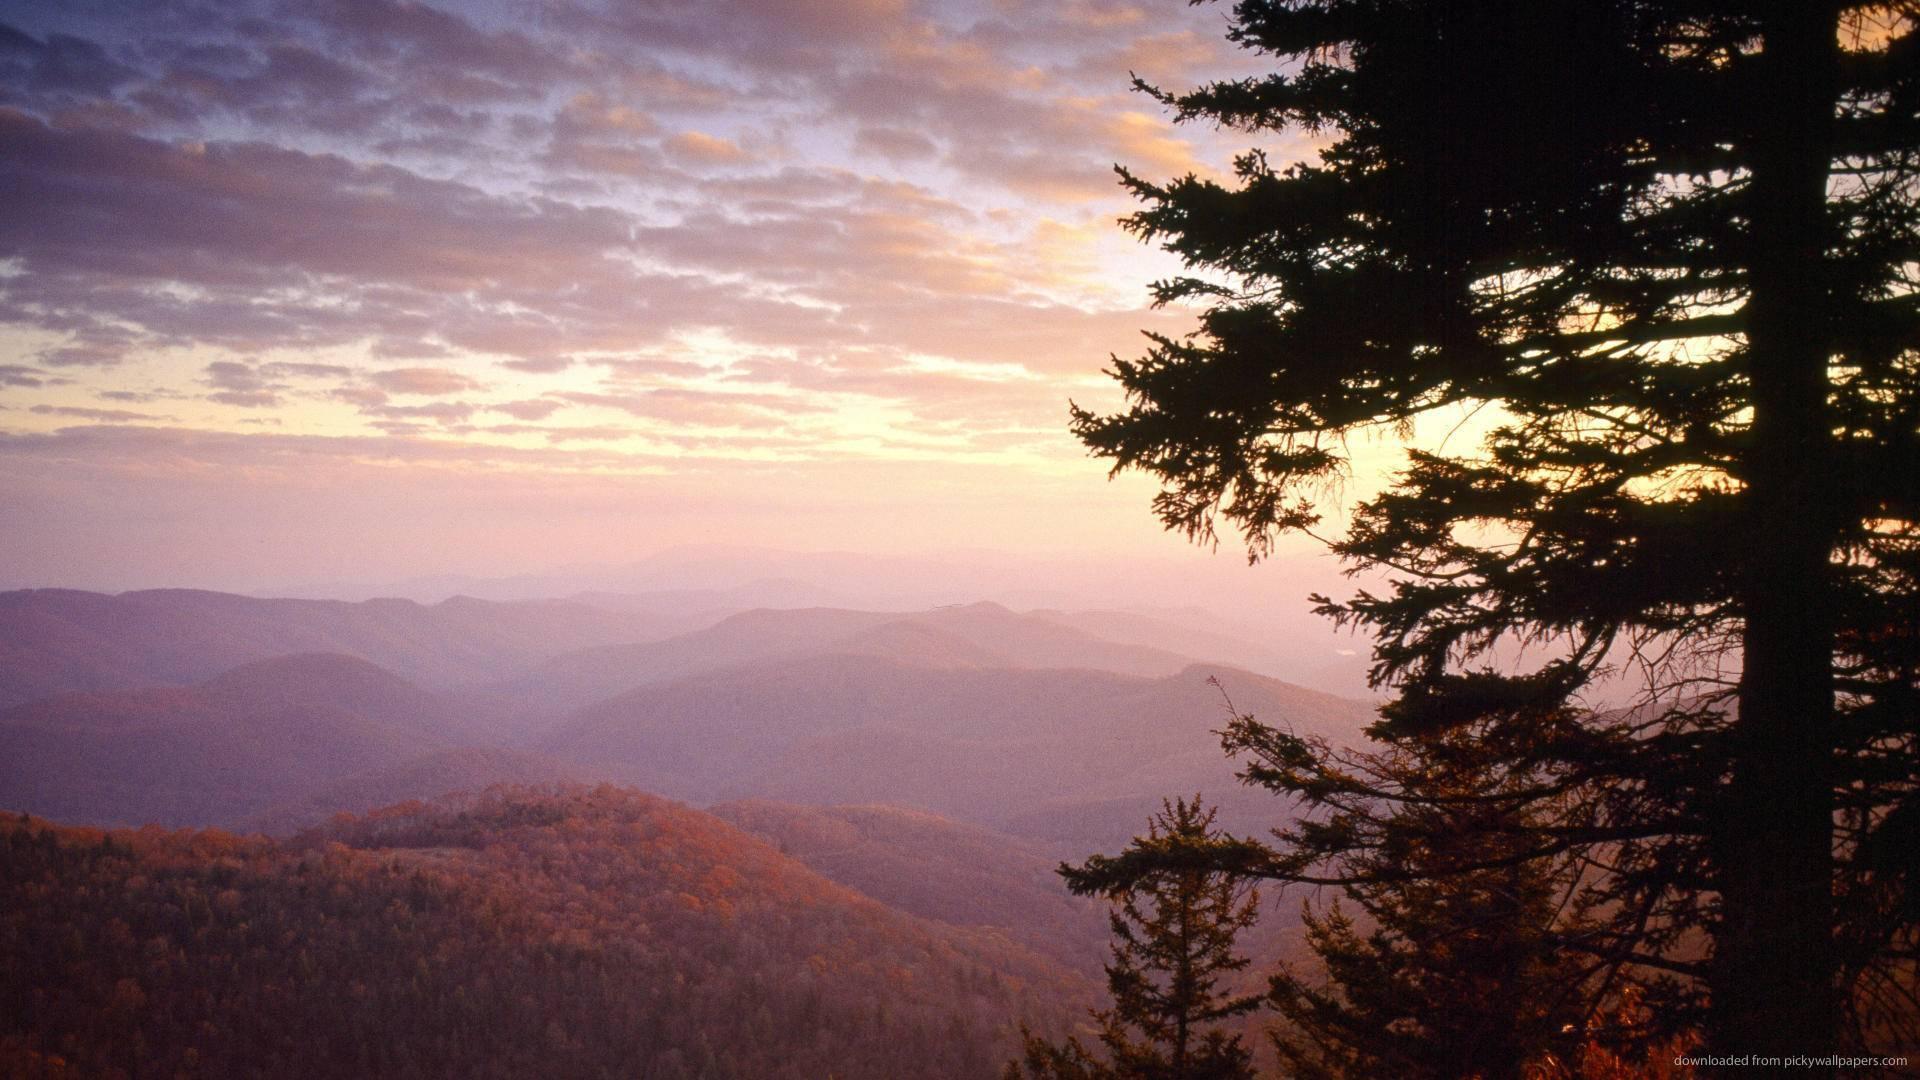 appalachian blue ridge mountains wallpaper - photo #21